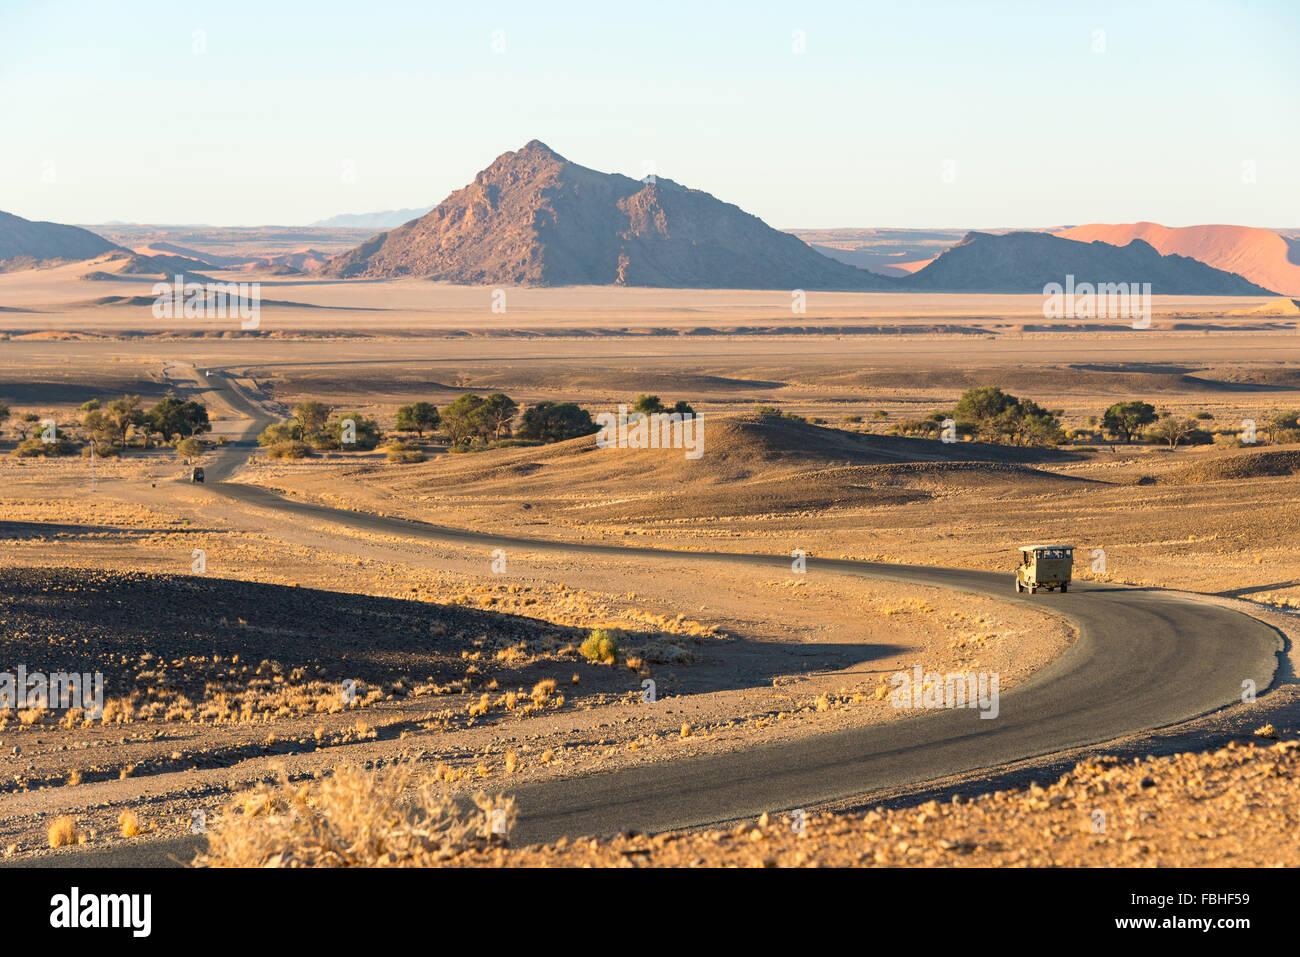 Road to Solitaire, Namib Naukluft Park, Namib Desert, Republic of Namibia - Stock Image